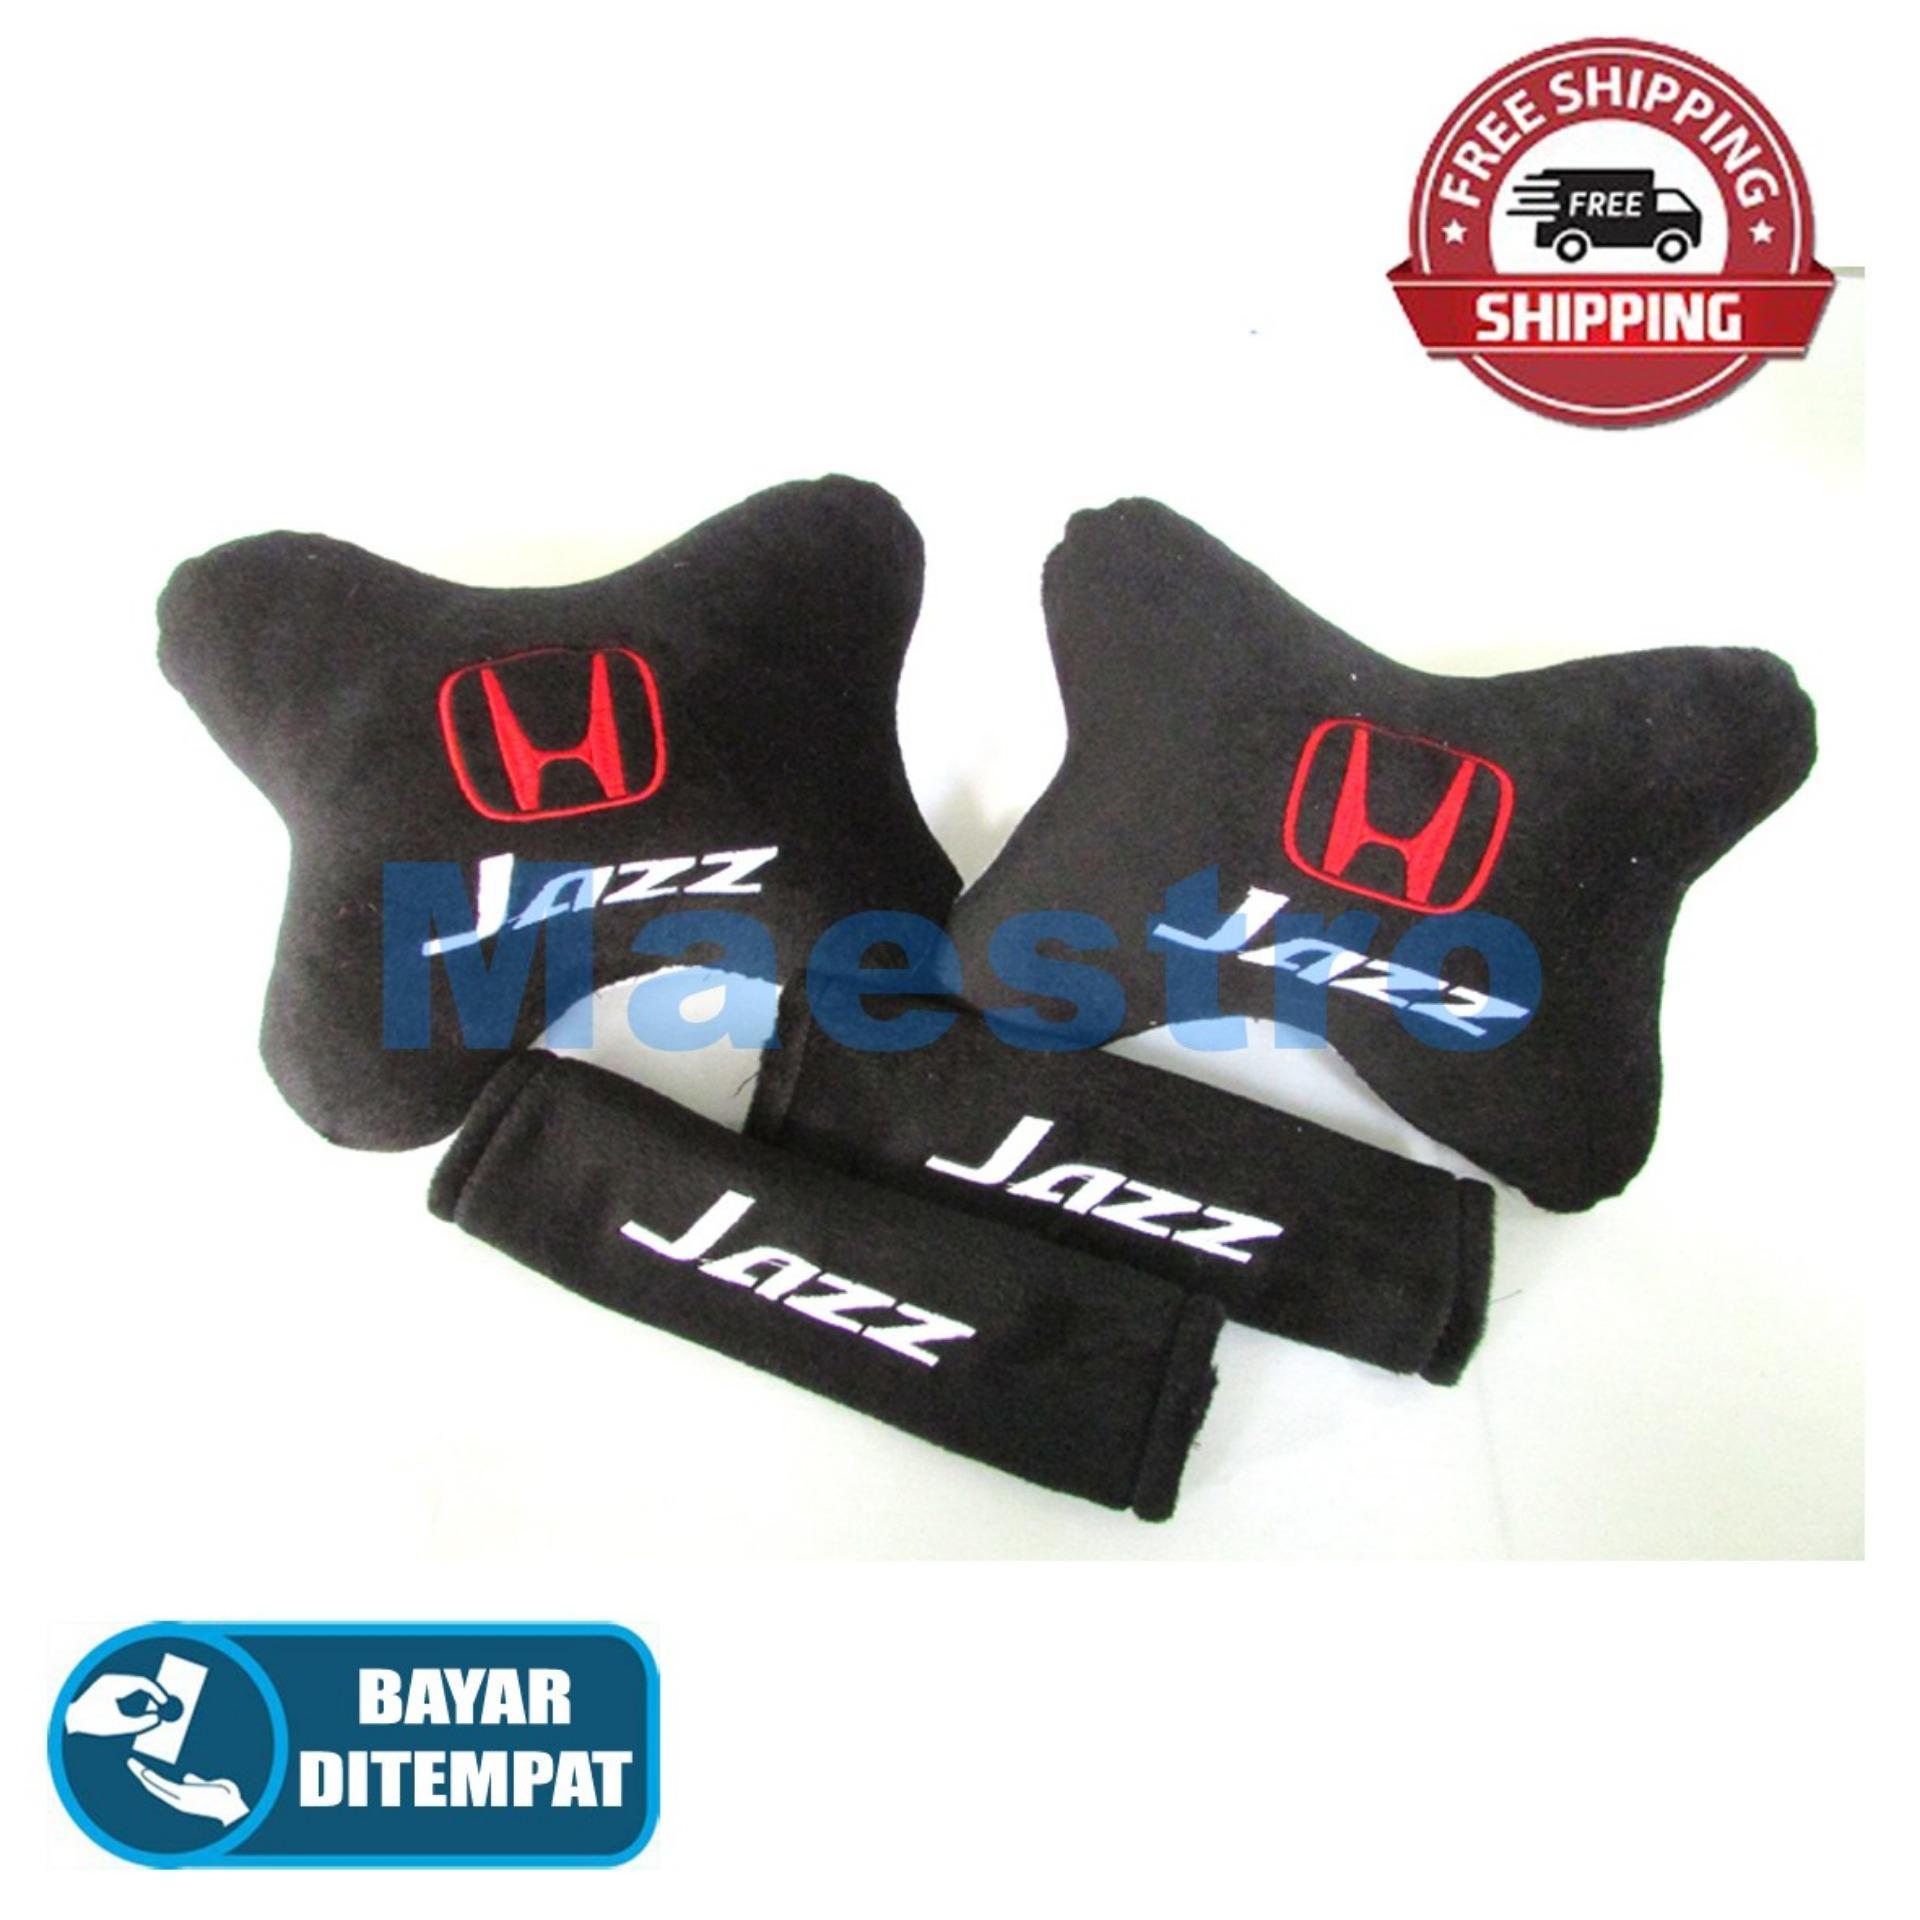 Aksesoris bantal leher jok mobil lucu unik Set 2in1 Honda Jazz